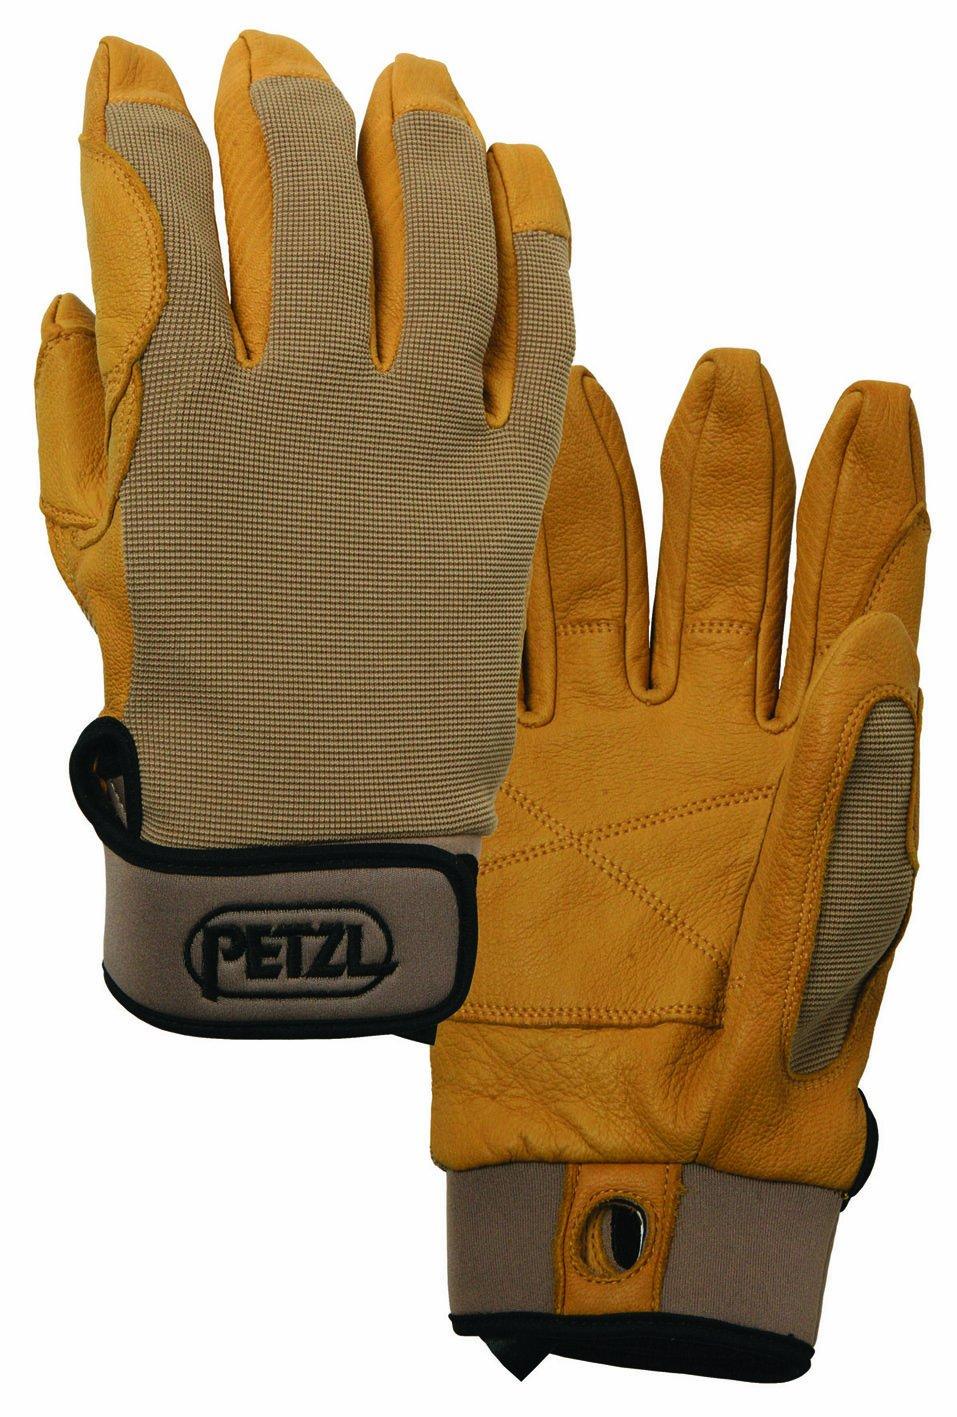 Petzl K52 XLT CORDEX Lightweight Belay/Rappel Glove, X-Large, Beige Petzl Company